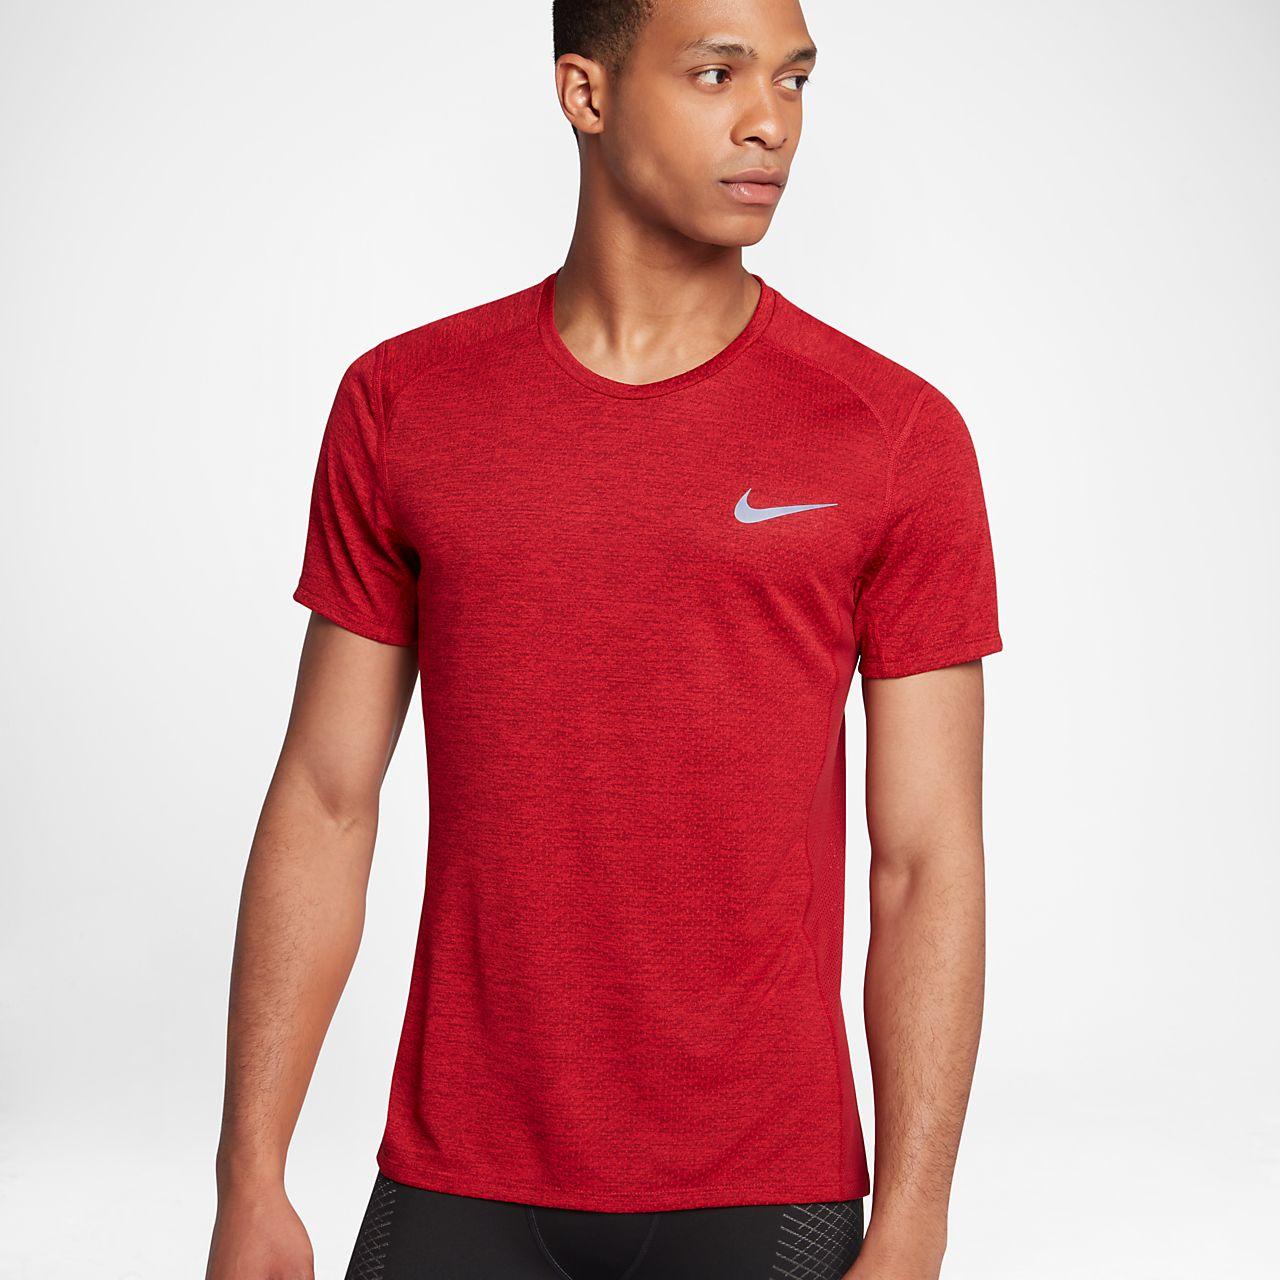 ZONAL COOL TOP SHORT SLEEVE MAX - CAMISETAS Y TOPS - Camisetas Nike qzkOX